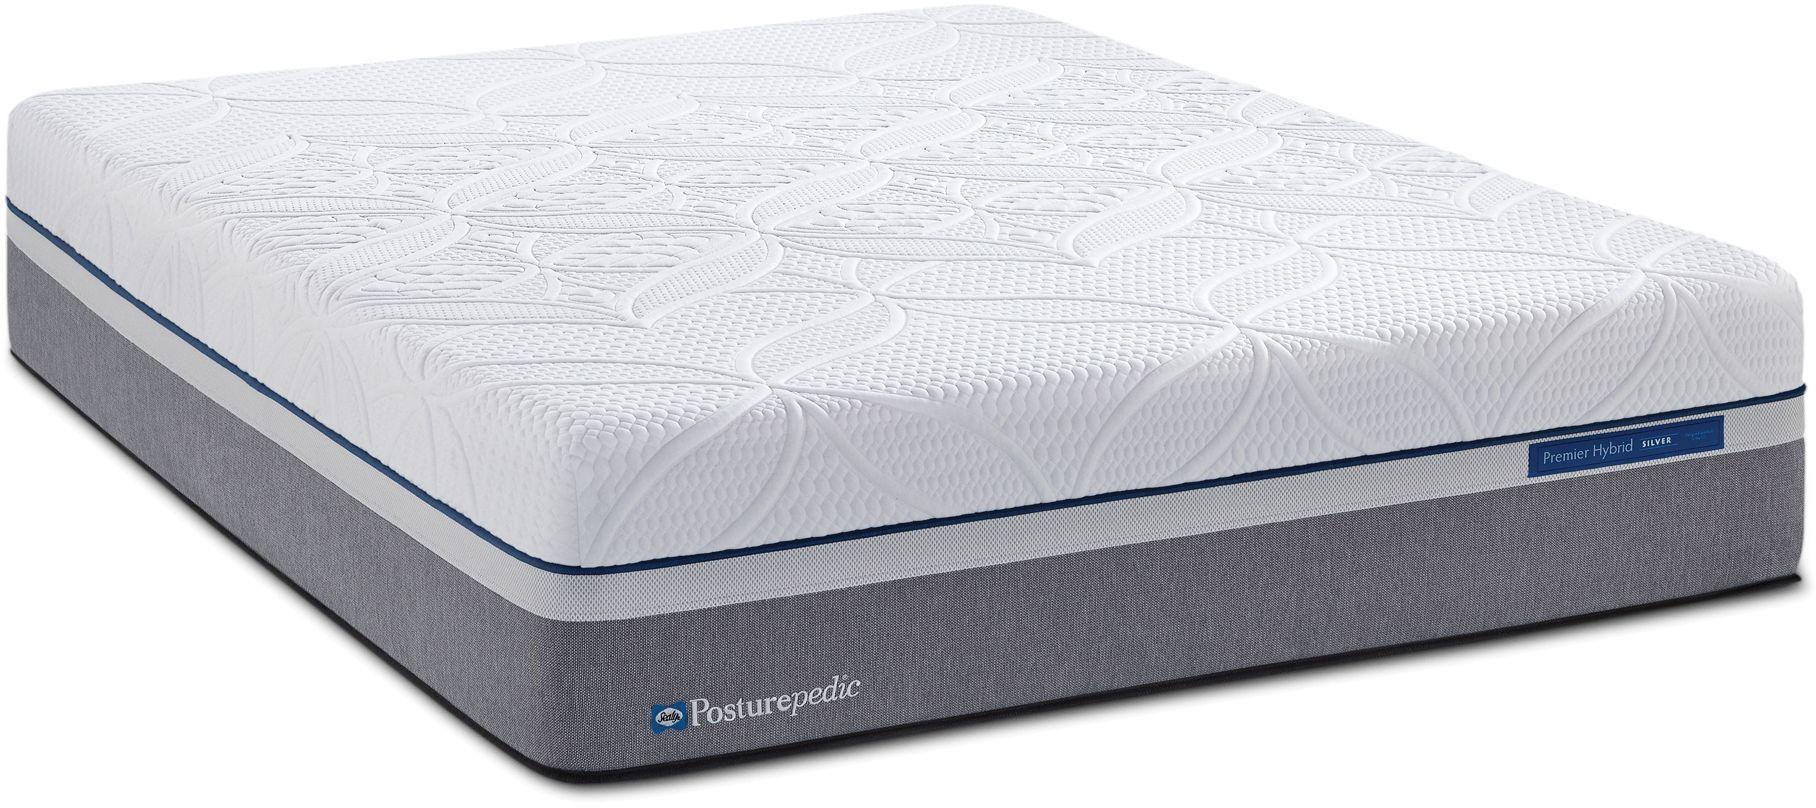 sealy posturepedic premier hybrid firm mattress lf02 mattresses adjustable beds in conway sc. Black Bedroom Furniture Sets. Home Design Ideas